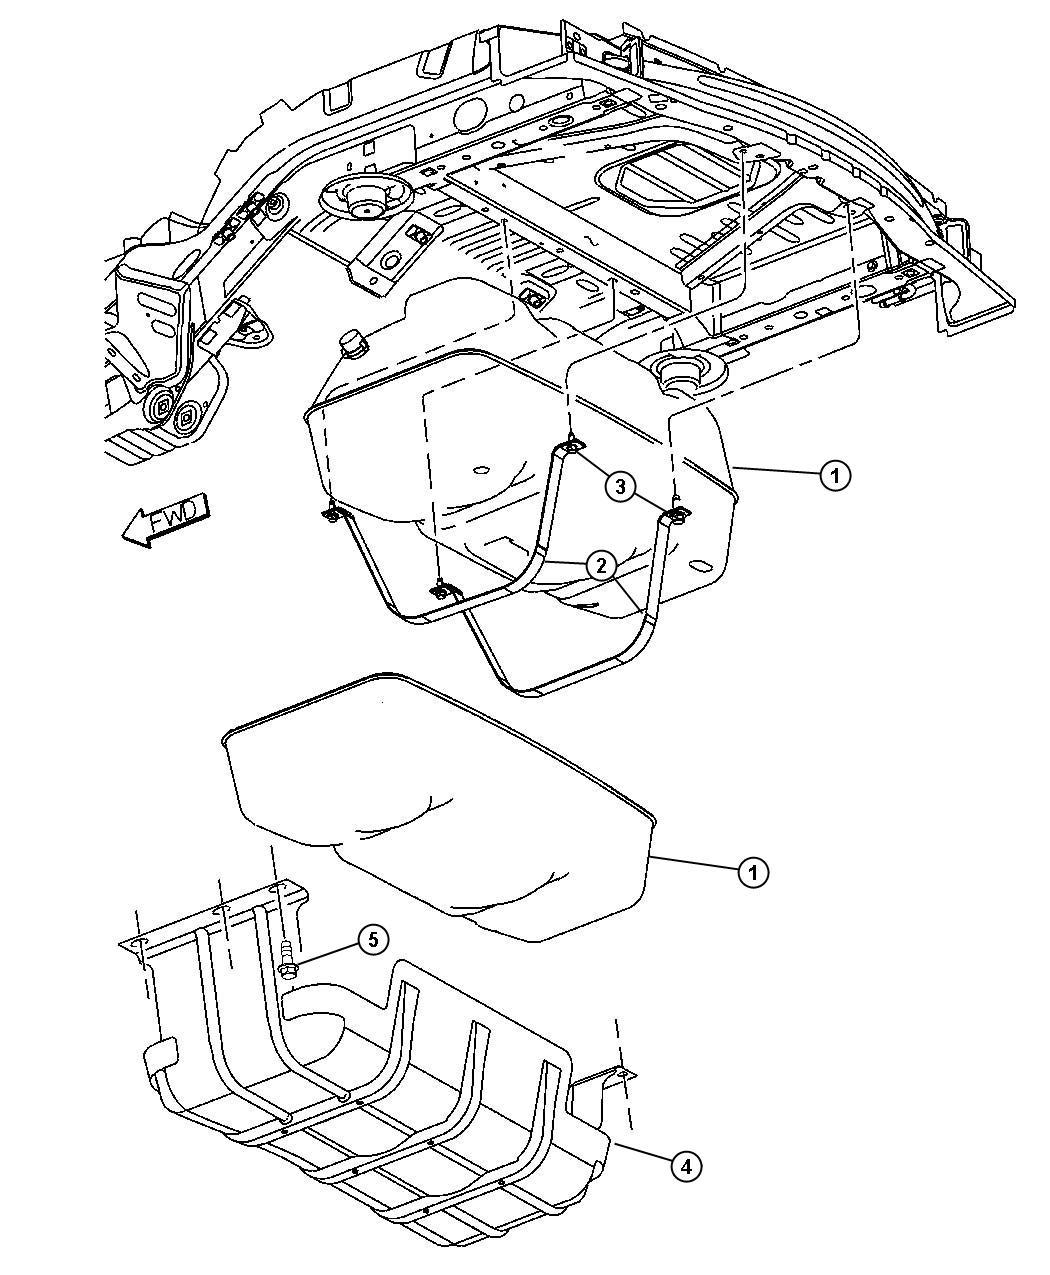 Jeep Liberty Filter Fuel Maintenance